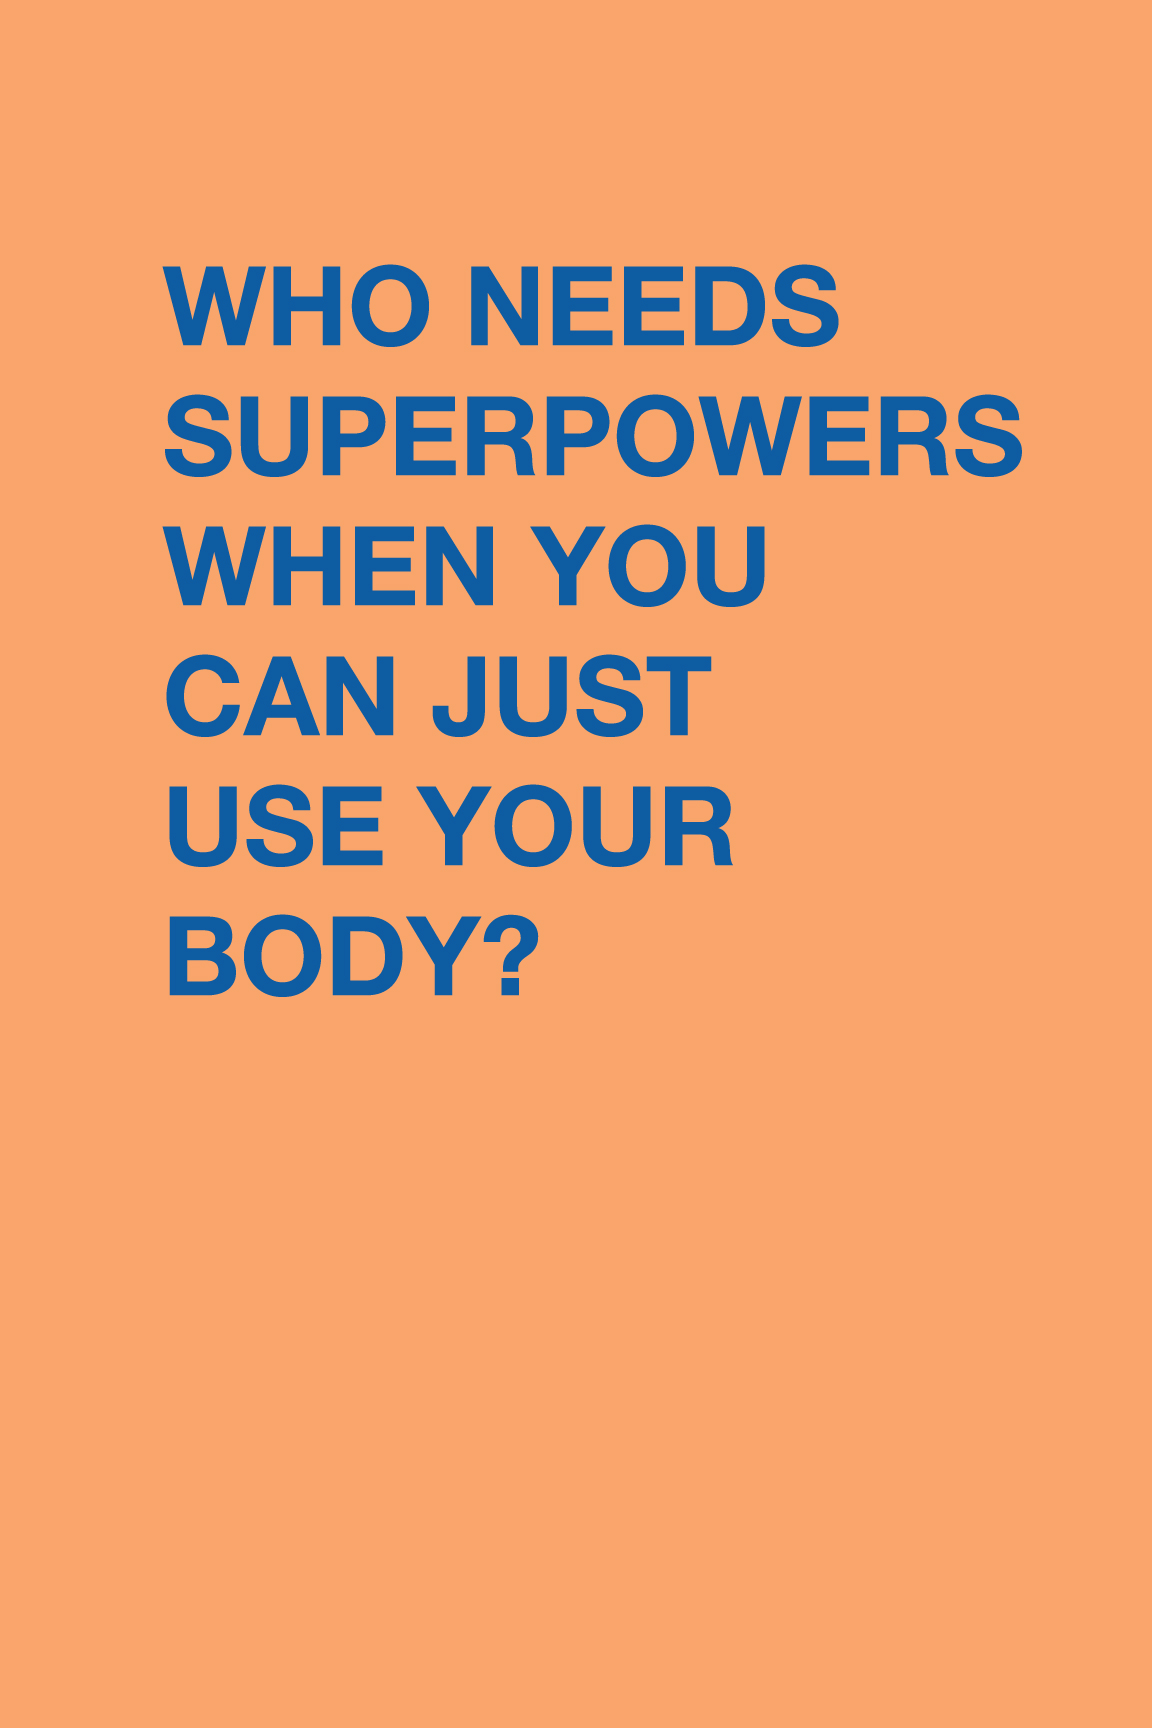 superpowers.jpg